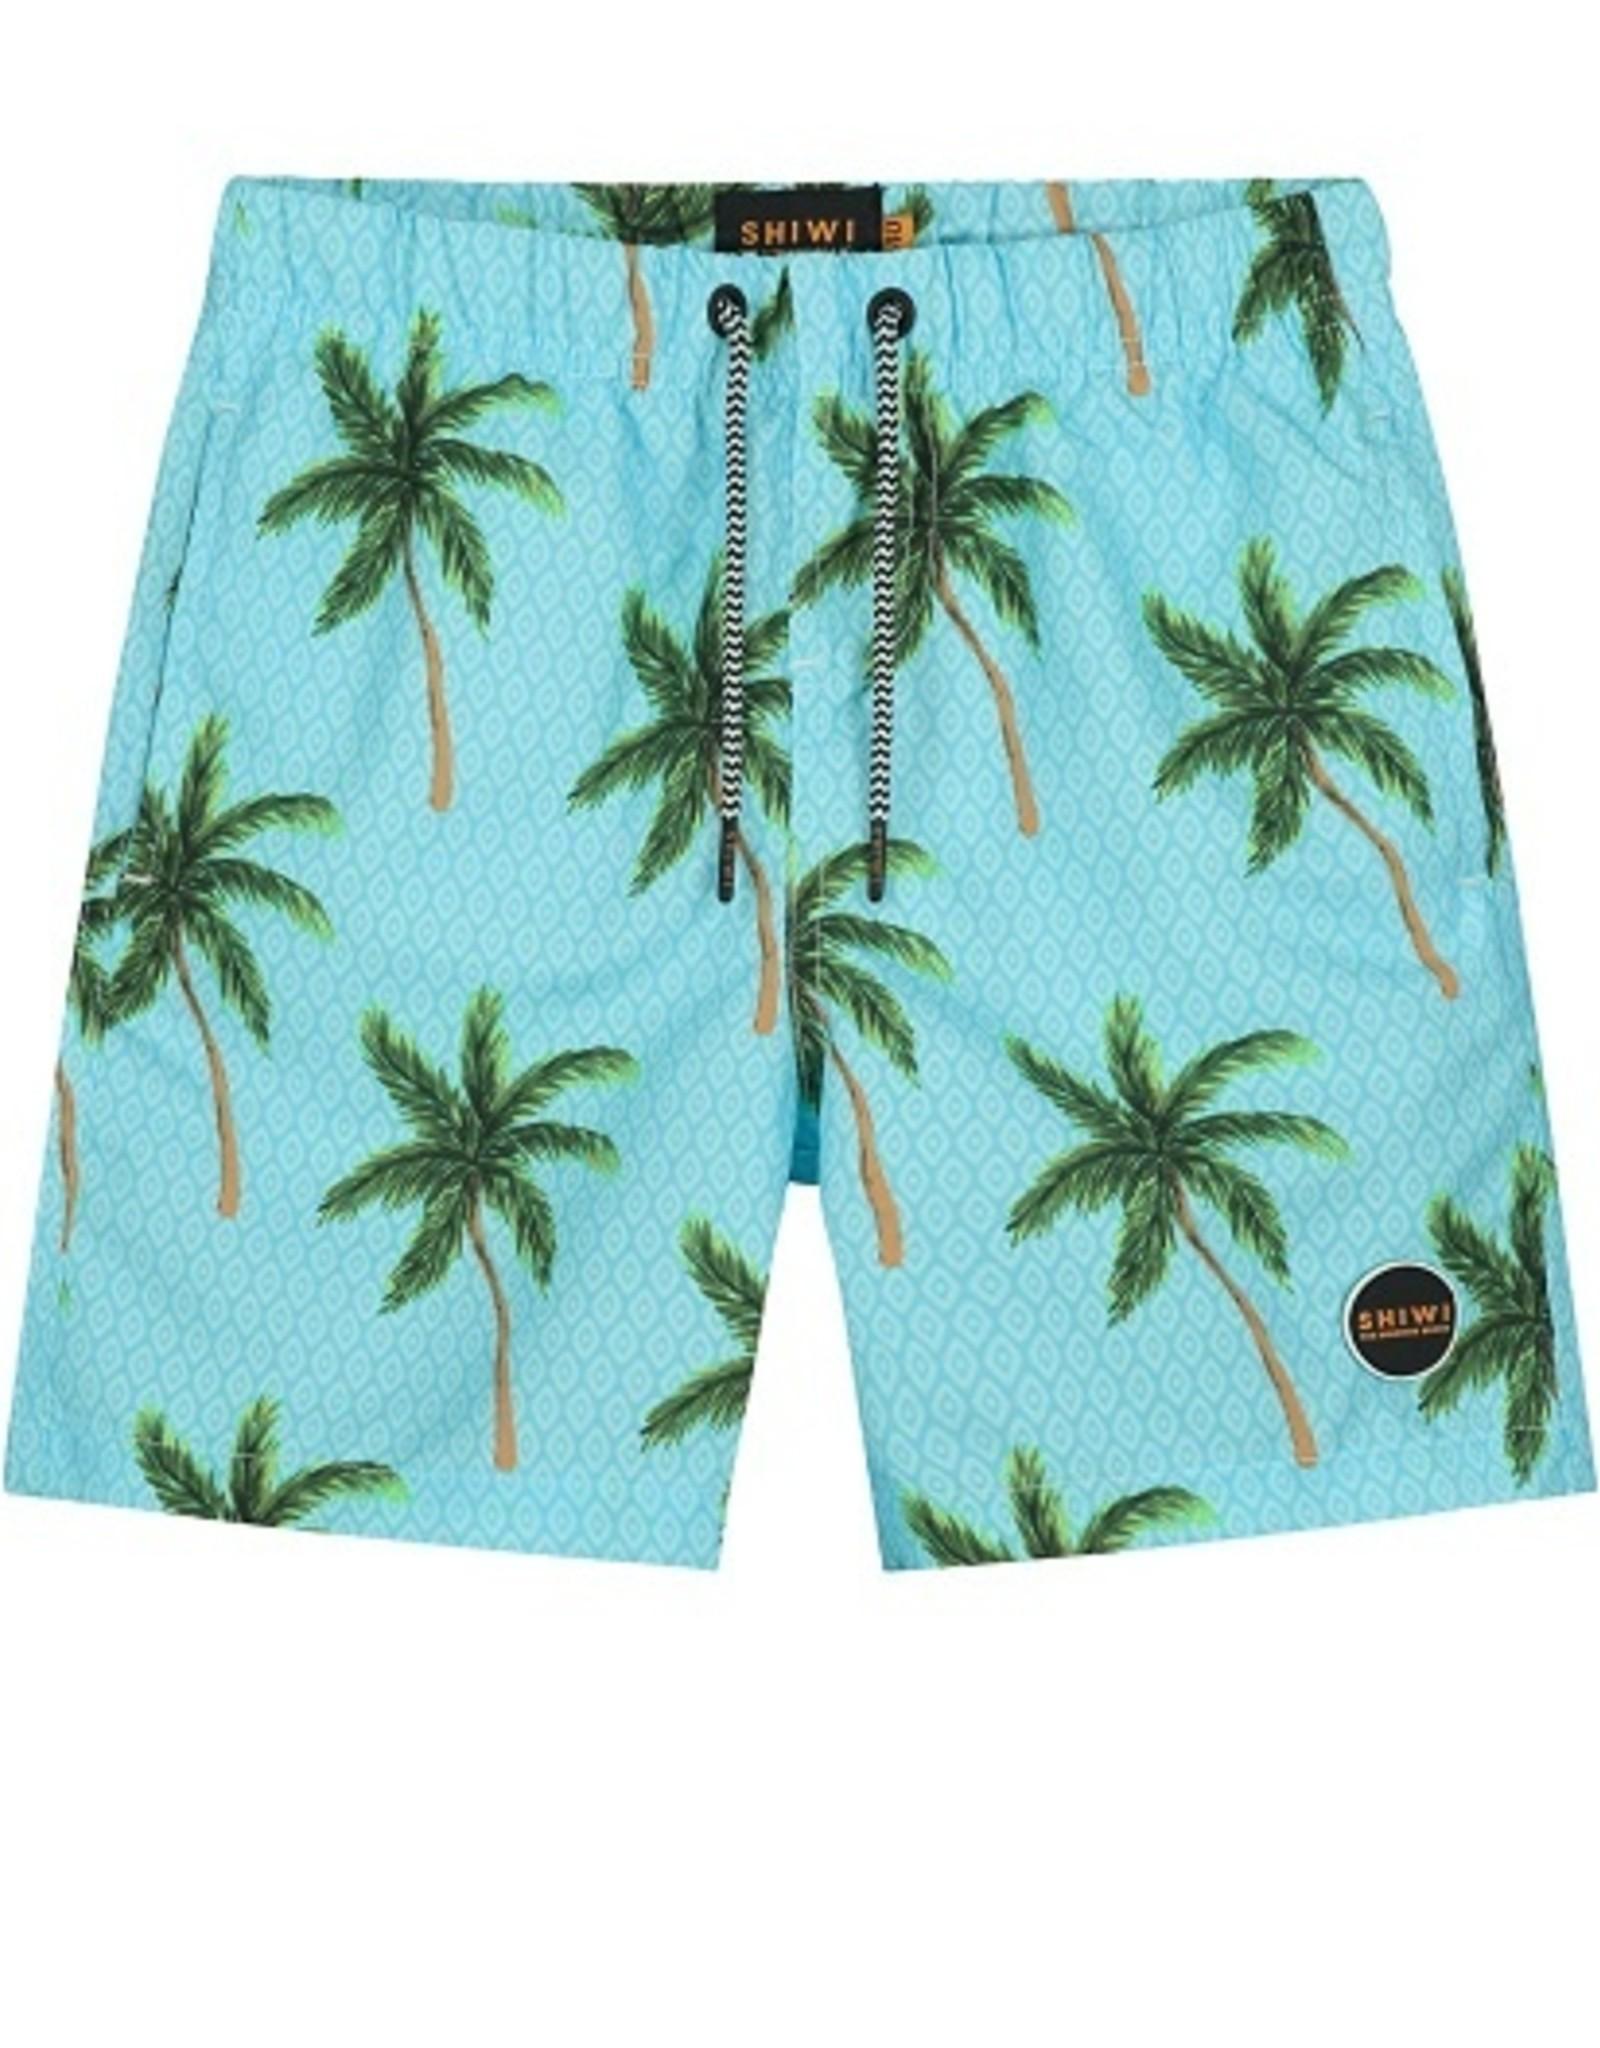 Shialy Zwemshort aqua palmbomen